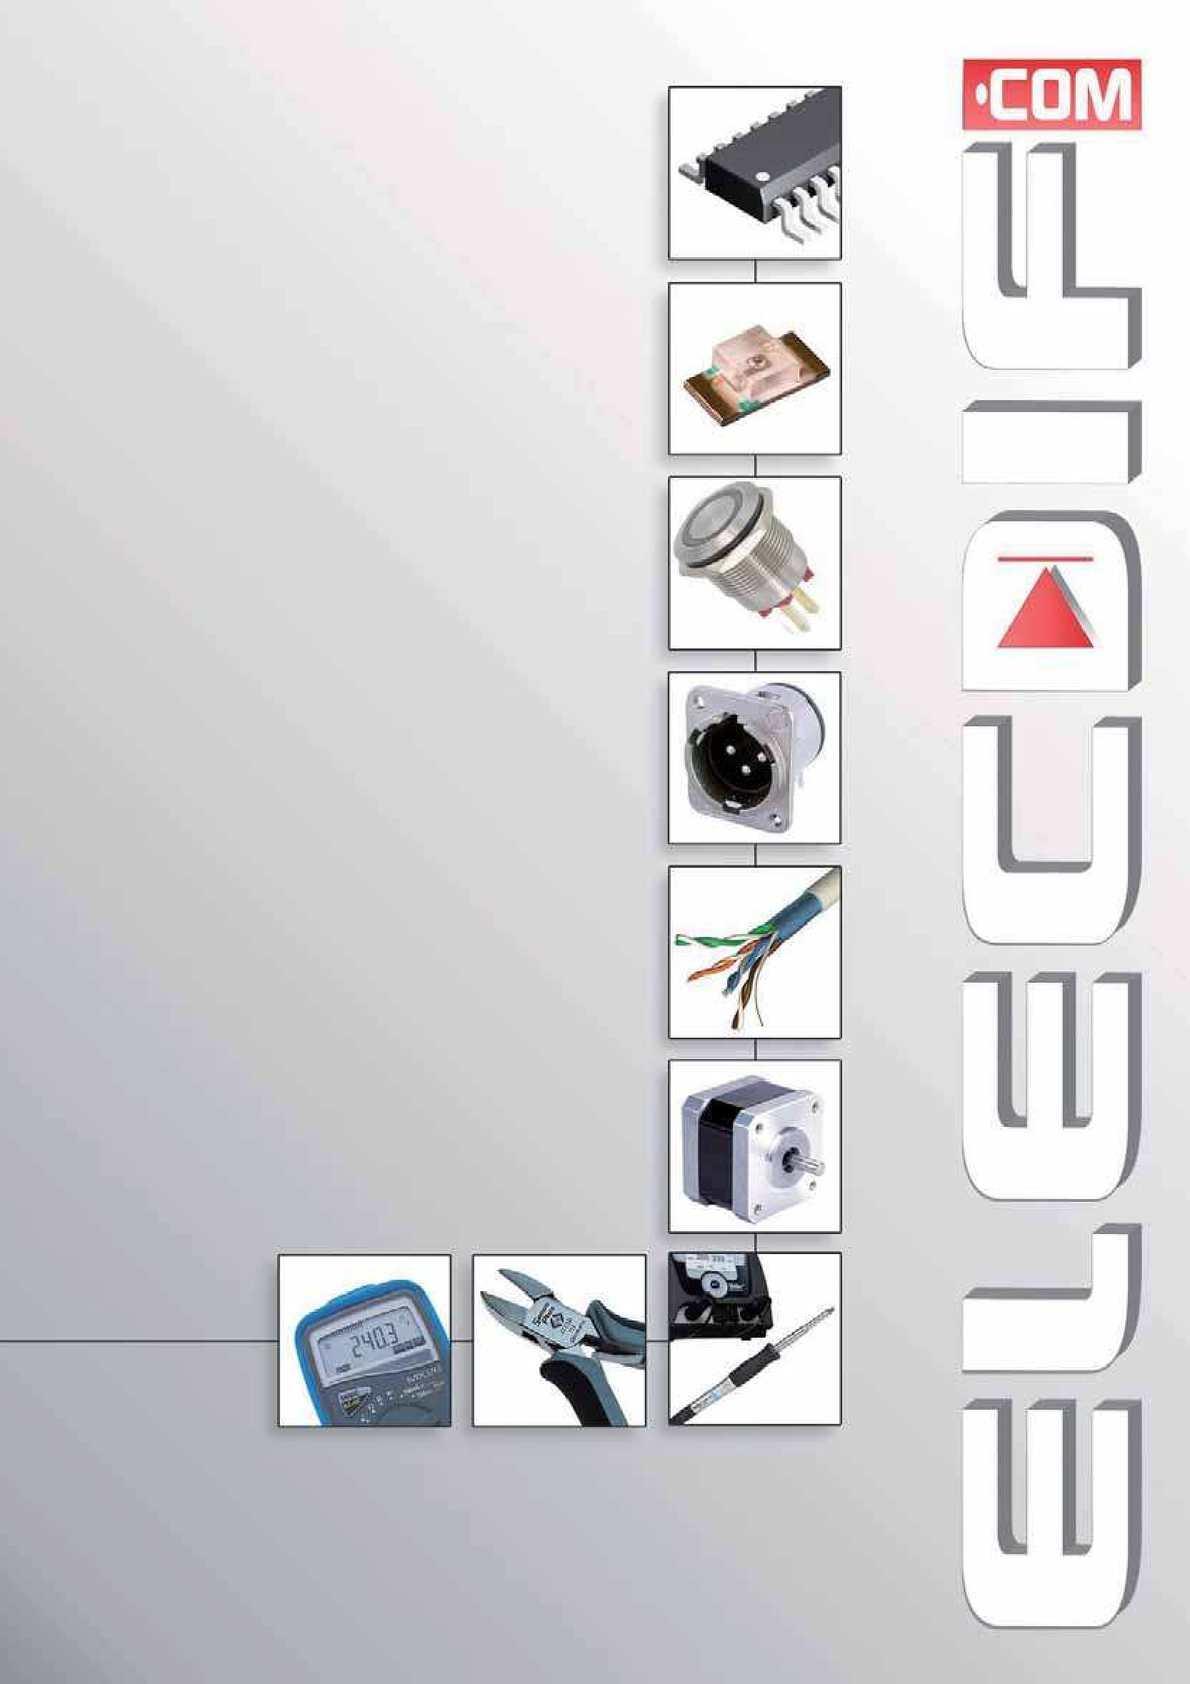 Calamo Elecdifcom Catalogue Composants Mesure Outillage Cnc Tactile Switch Push Button Tc 1212t 12x12x73 Mm For Arduino Free Cap